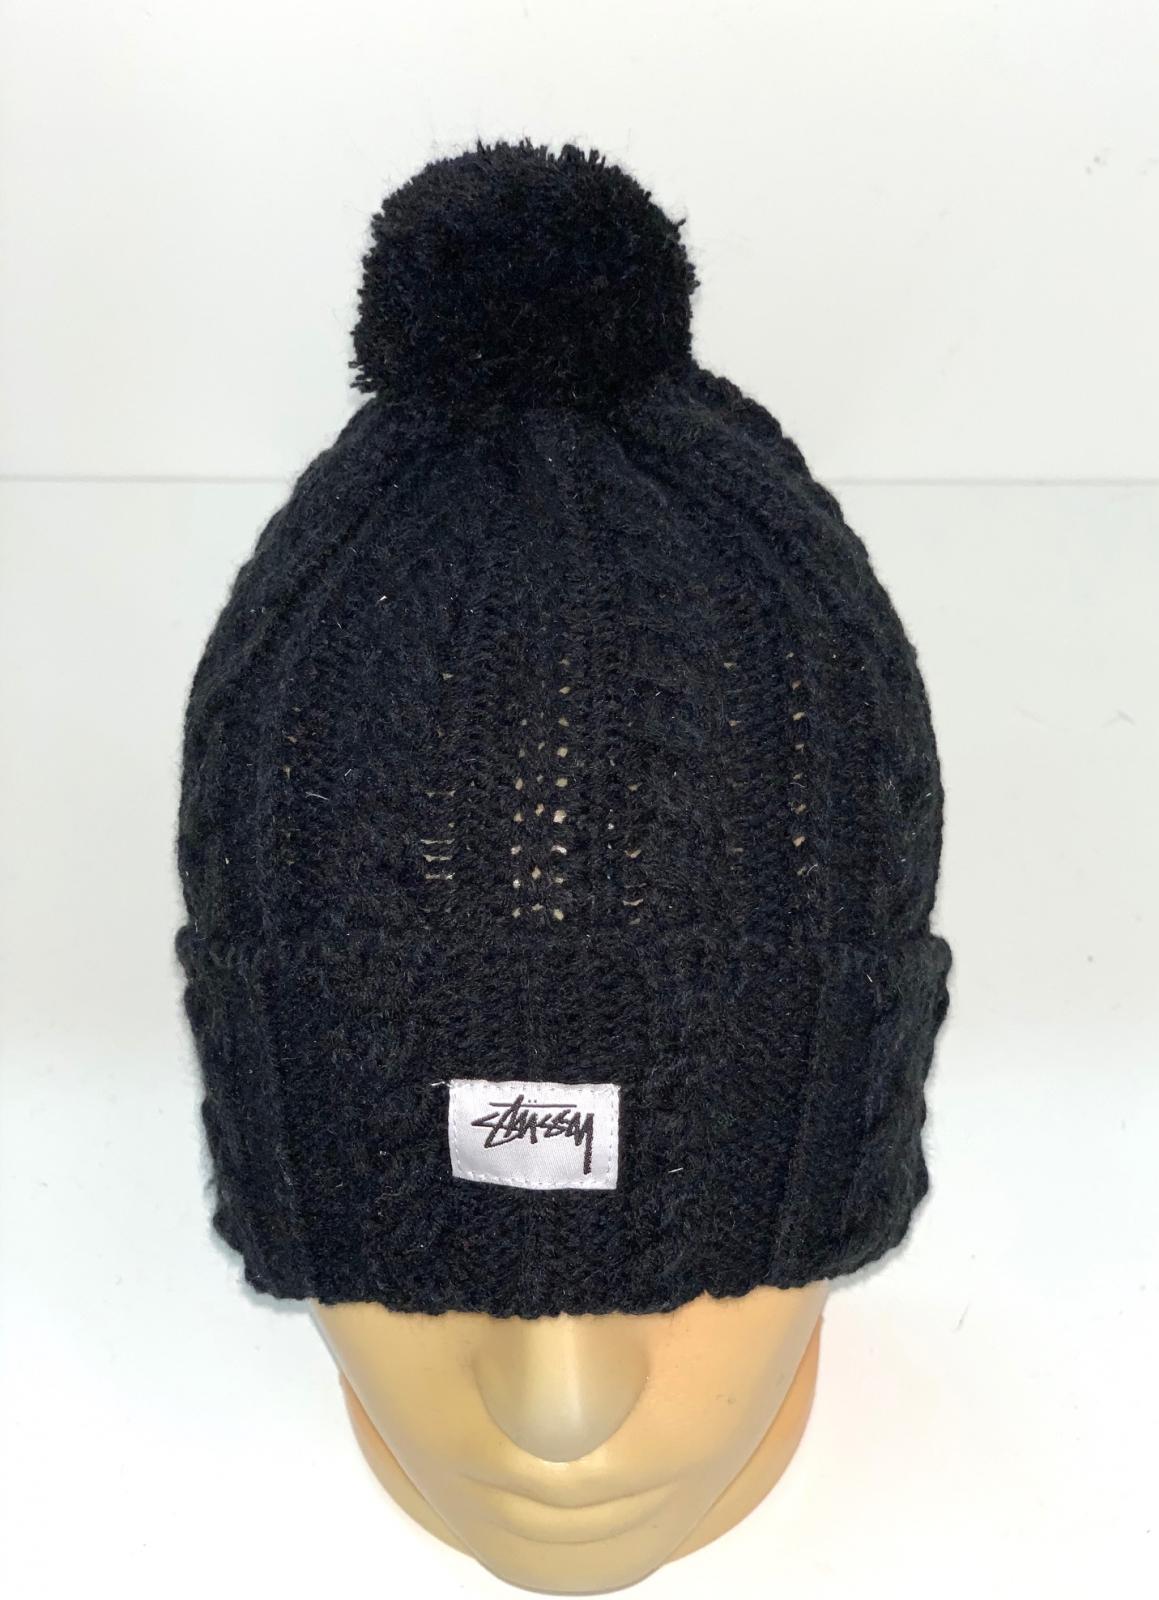 Крутая вязаная шапка с помпоном